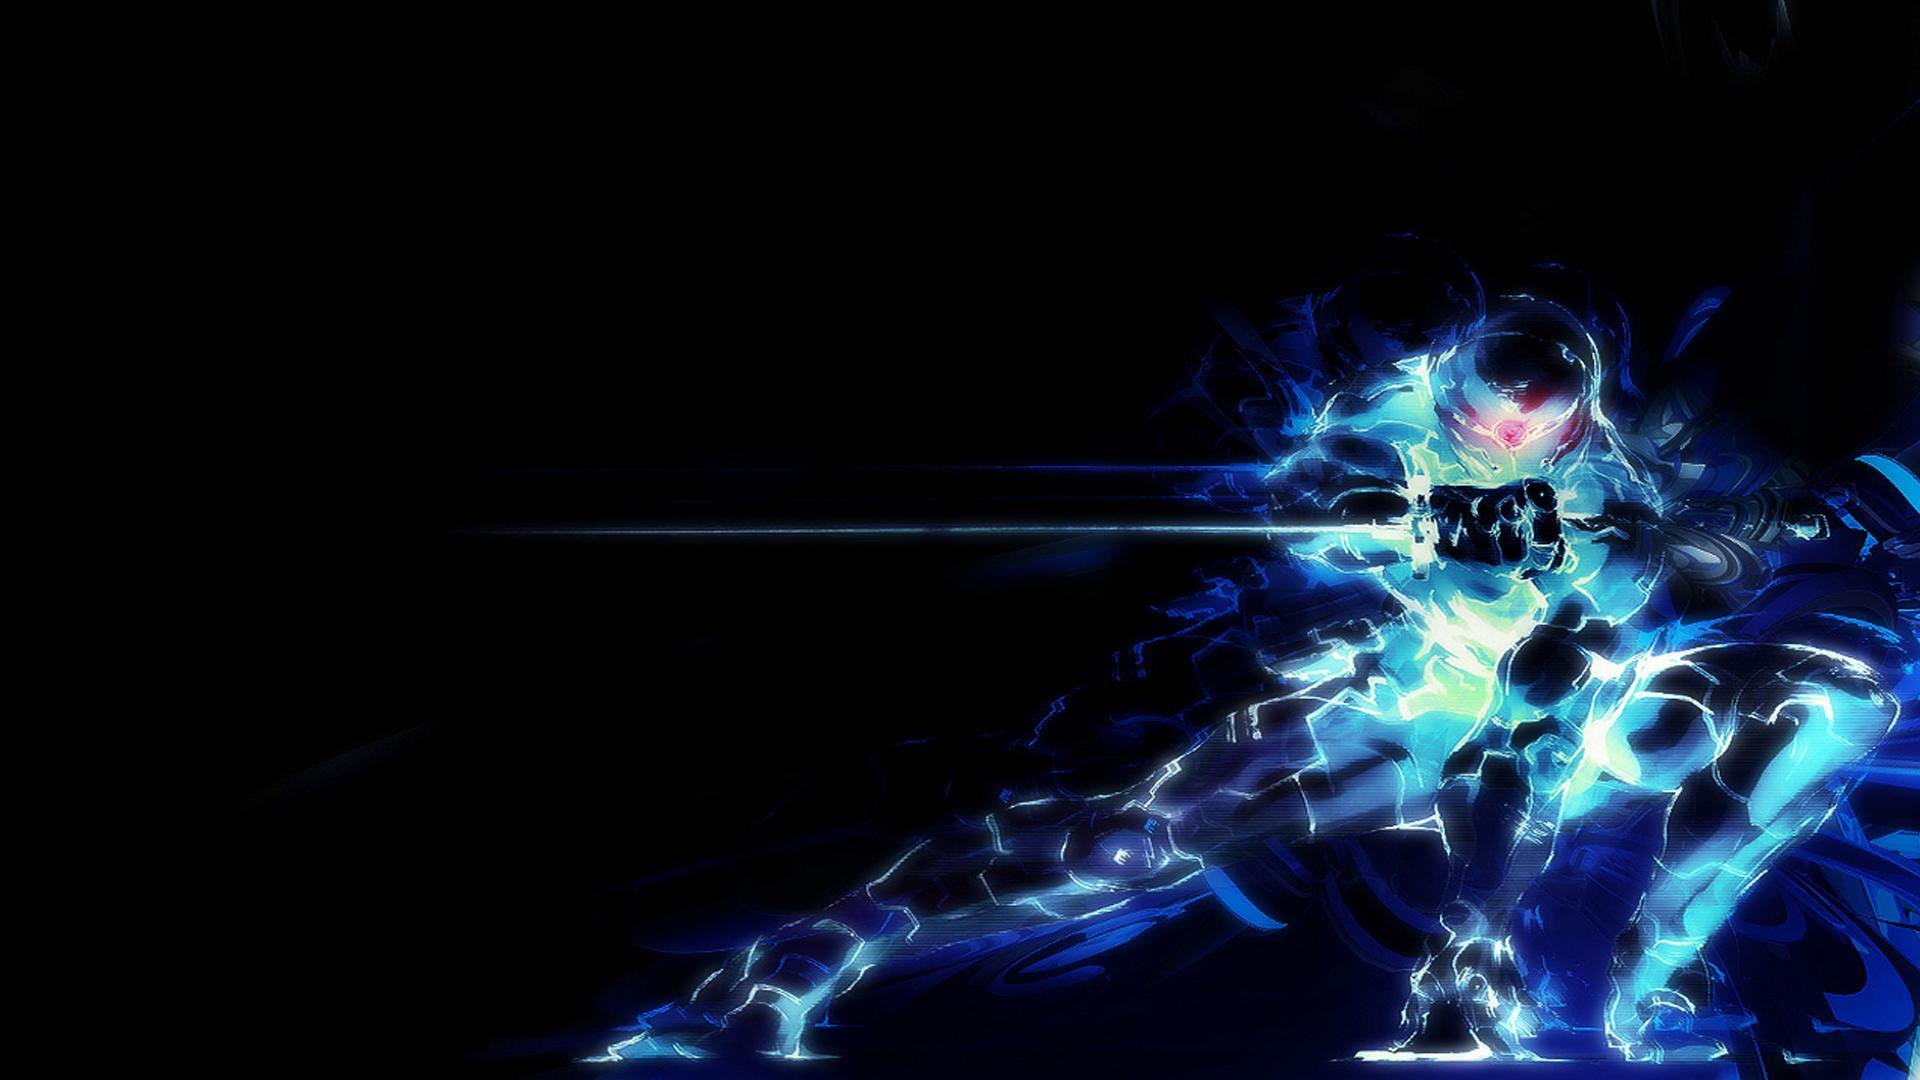 mgs-cyborg-ninja-1920×1080-wallpaper-wpc9001378